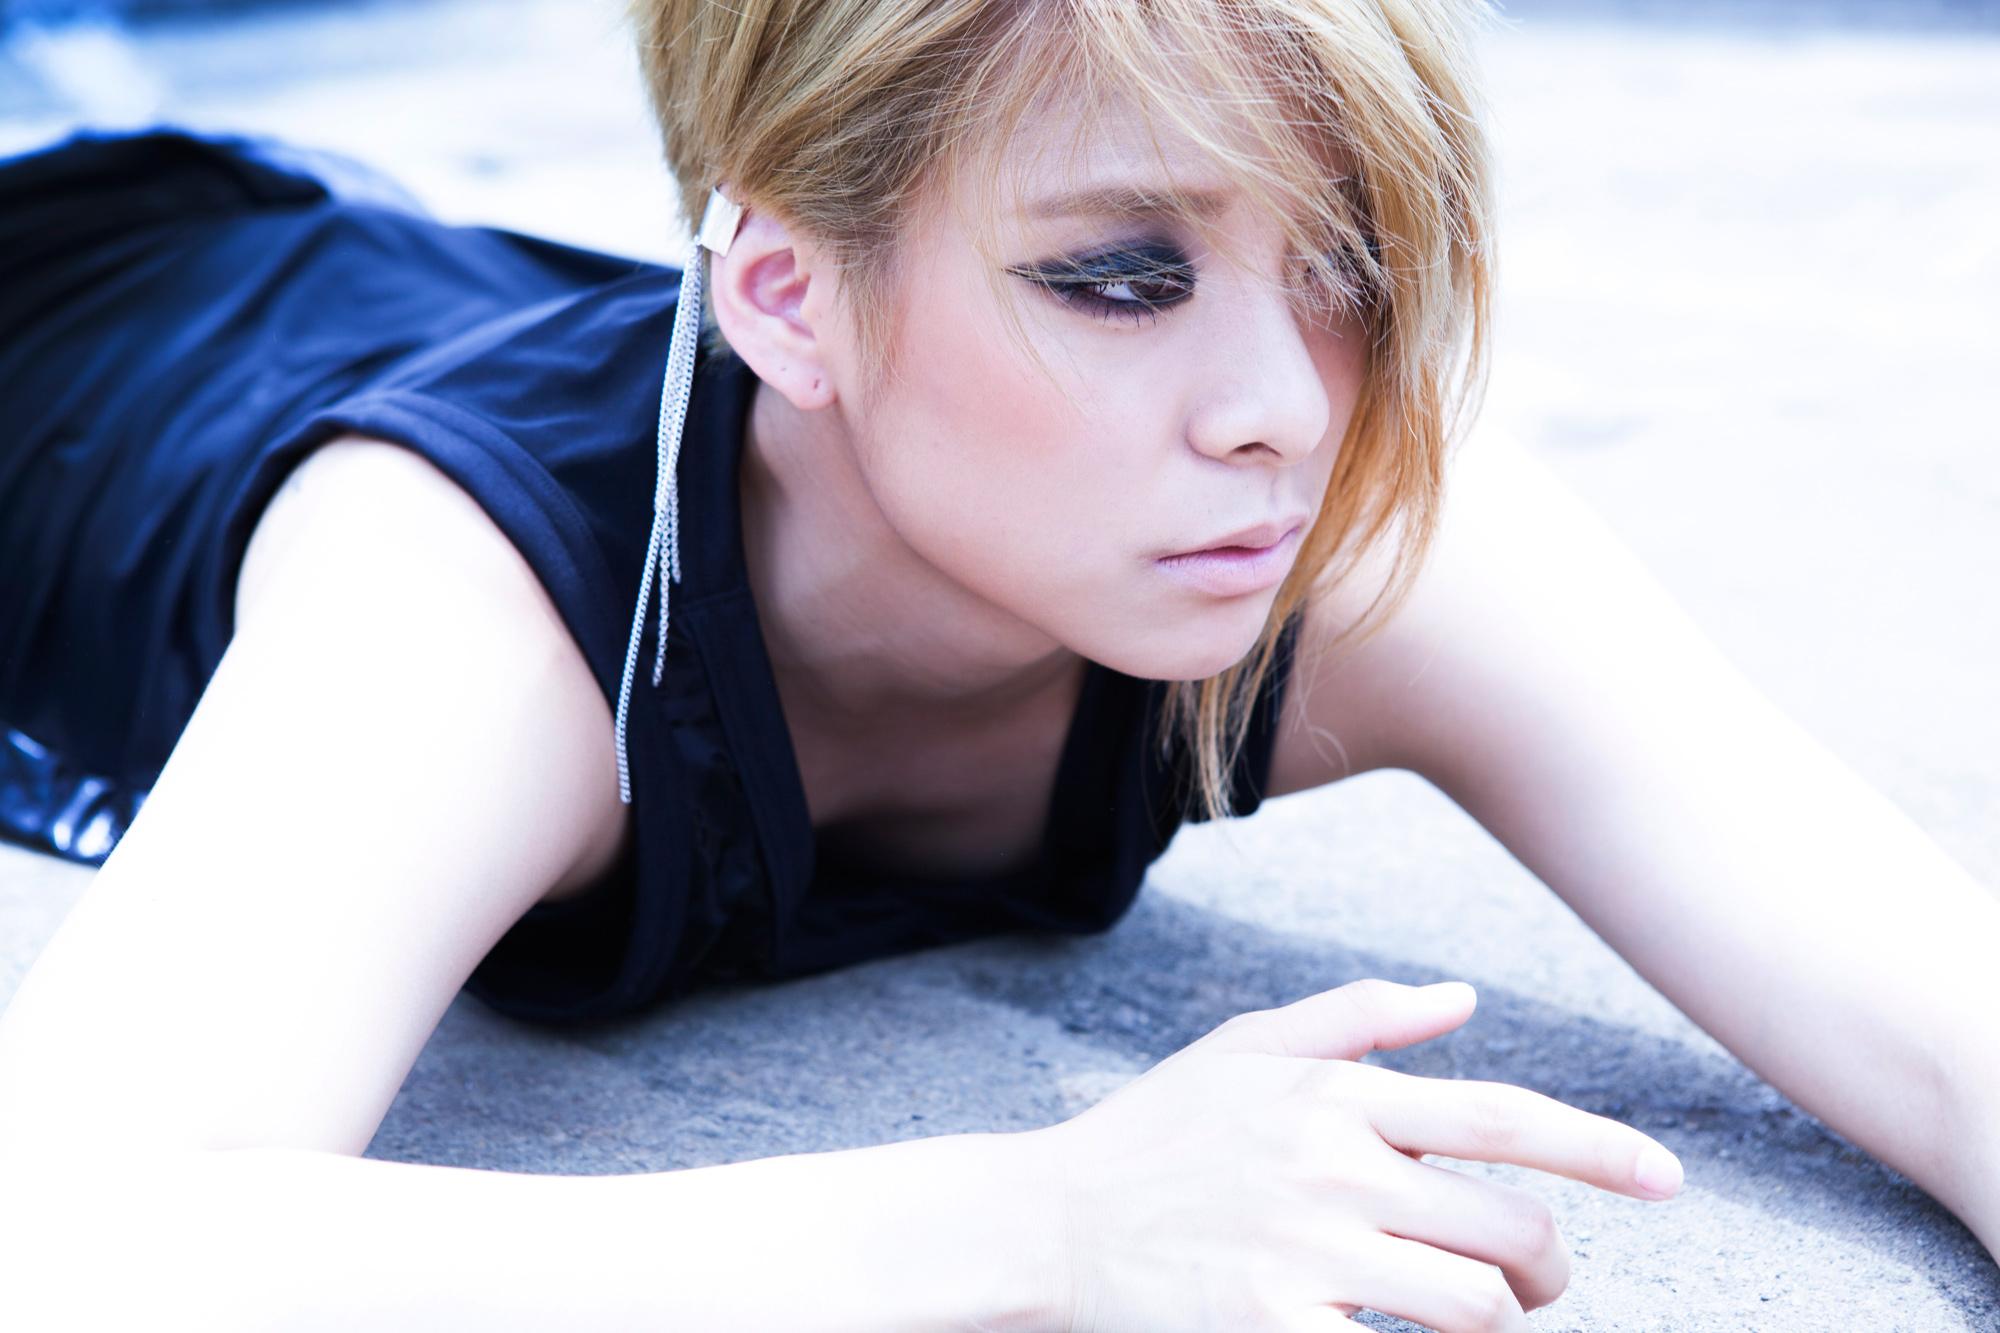 Amber de f(x) publica preocupante mensaje sobre dificultades